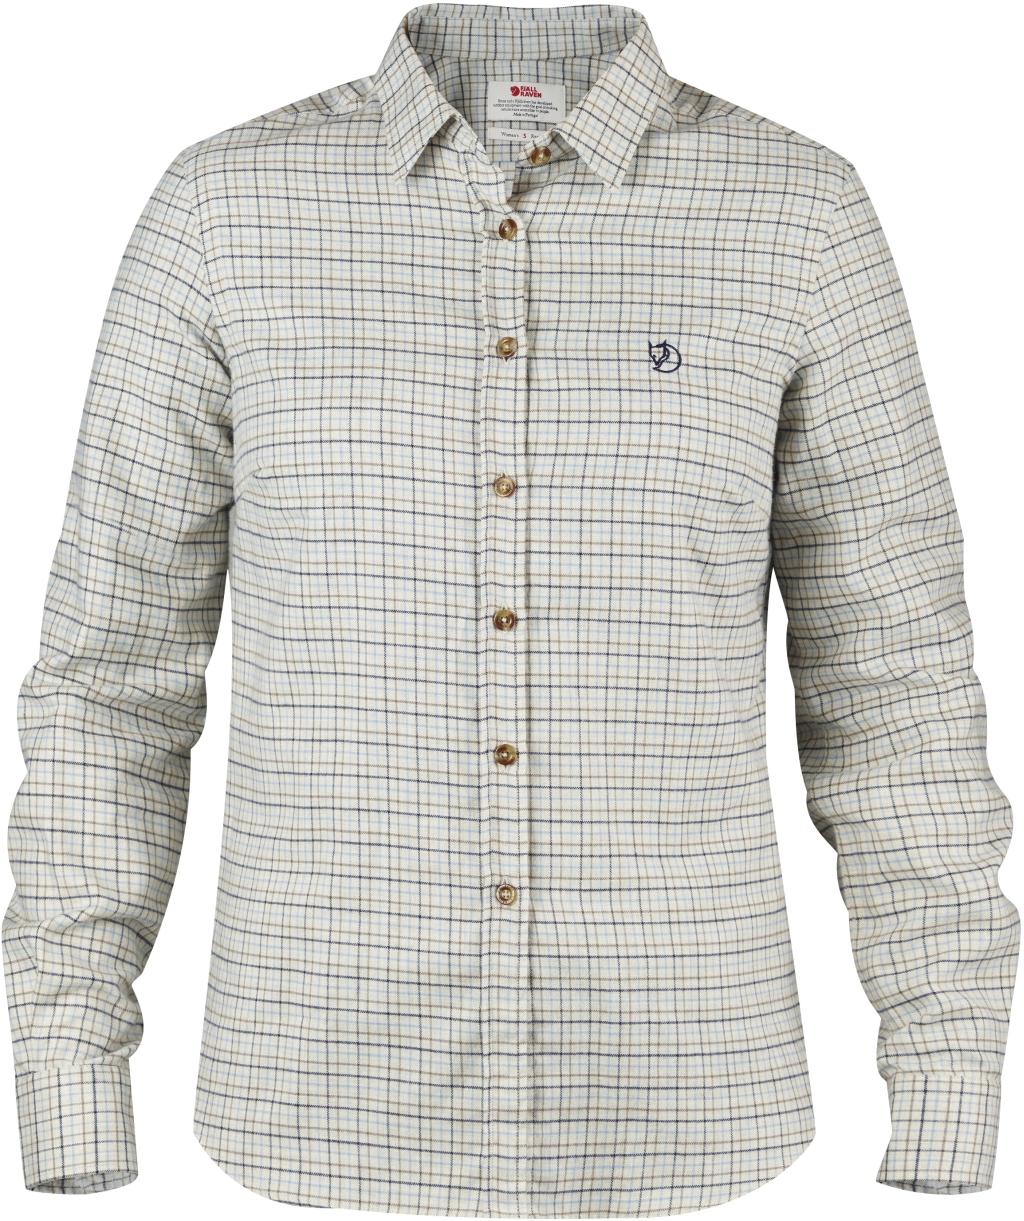 FjallRaven Sormland Flannel Shirt LS W Eggshell-30